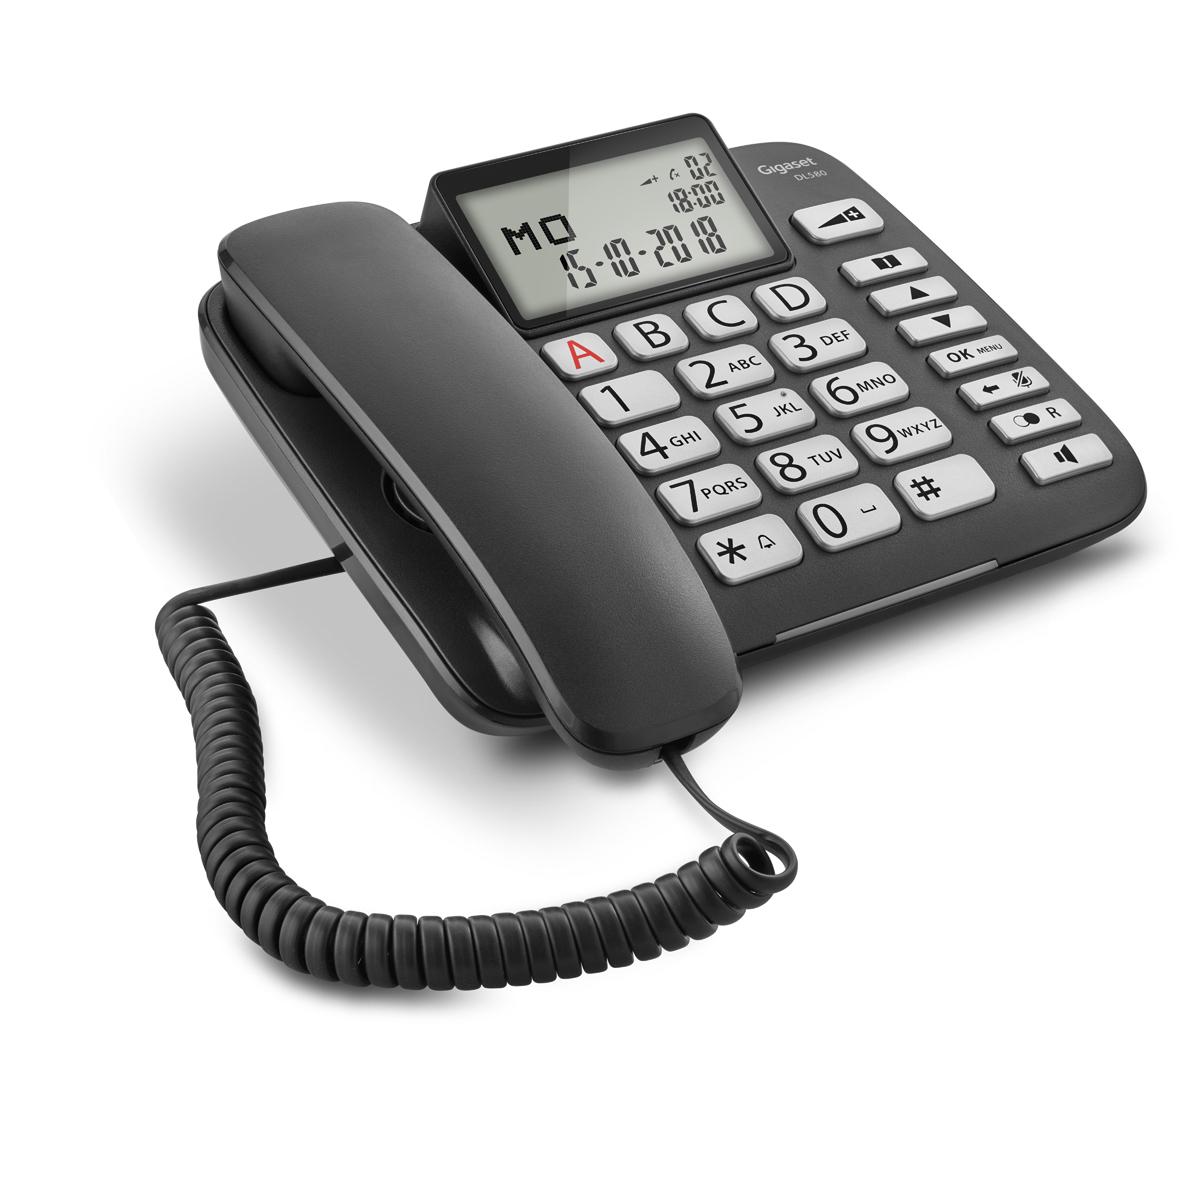 Buy Gigaset DL580 corded telephone